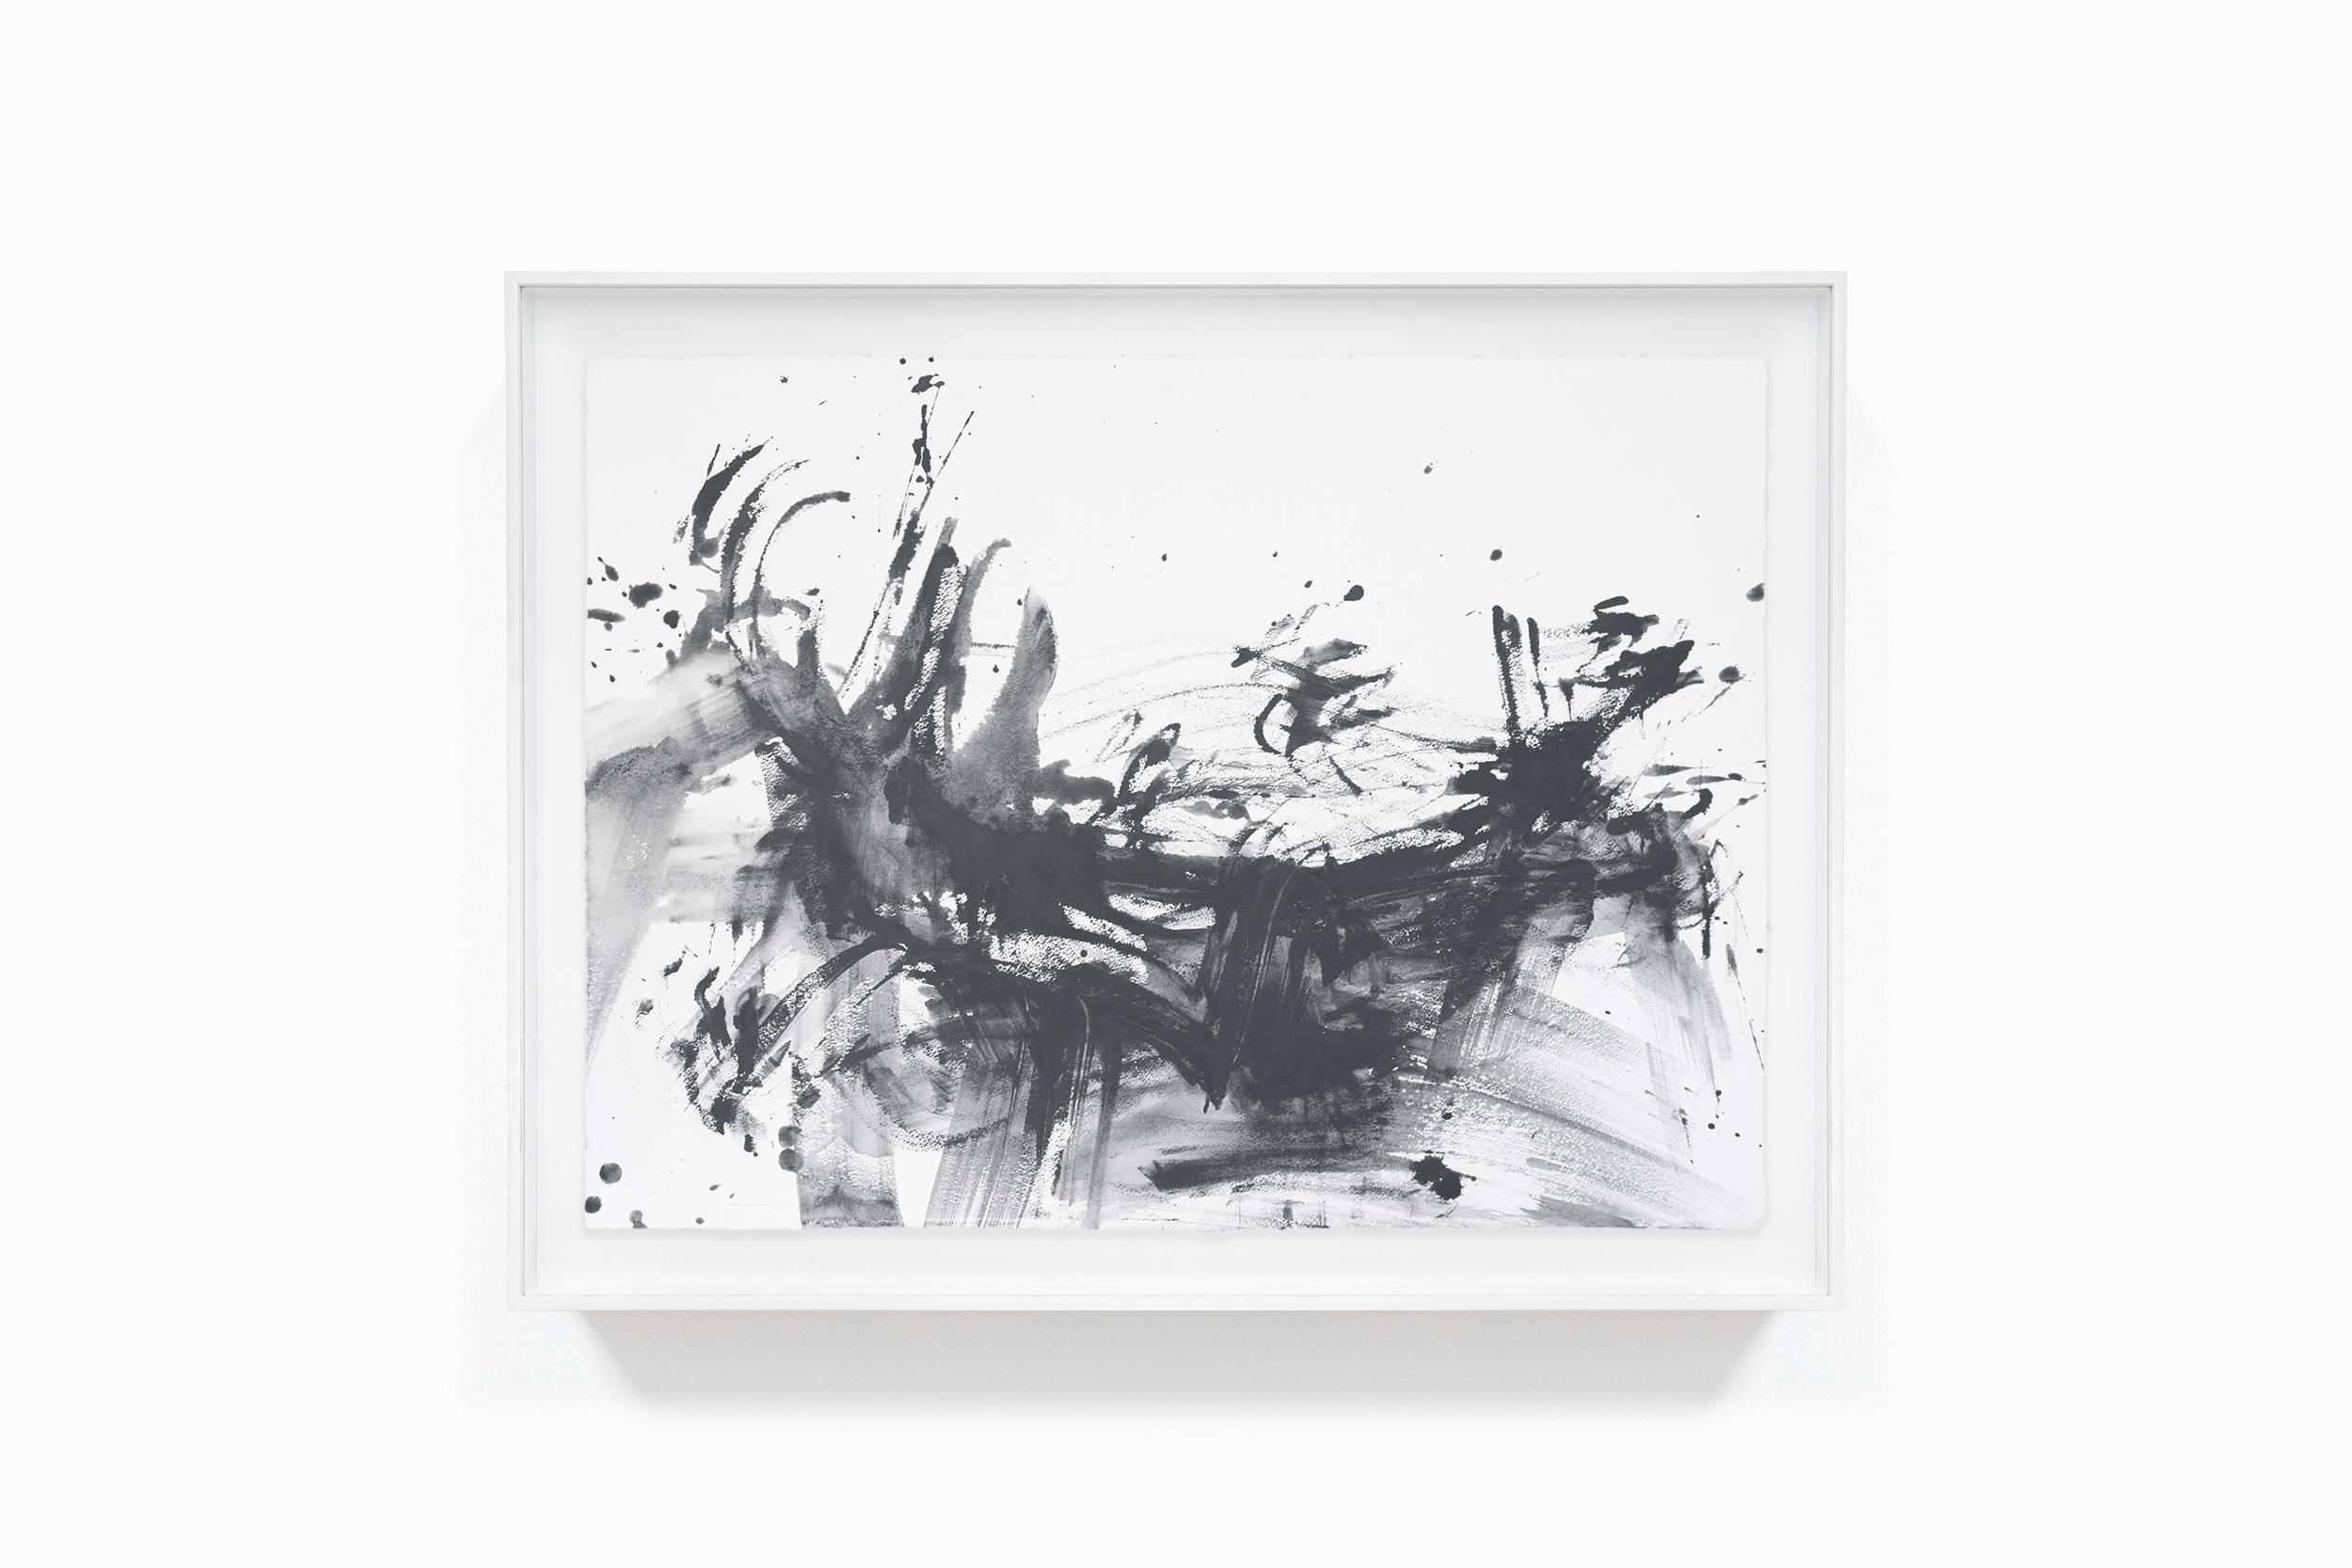 091C Andre Gigante Pintura Painting bonjourmolotov La.jpg